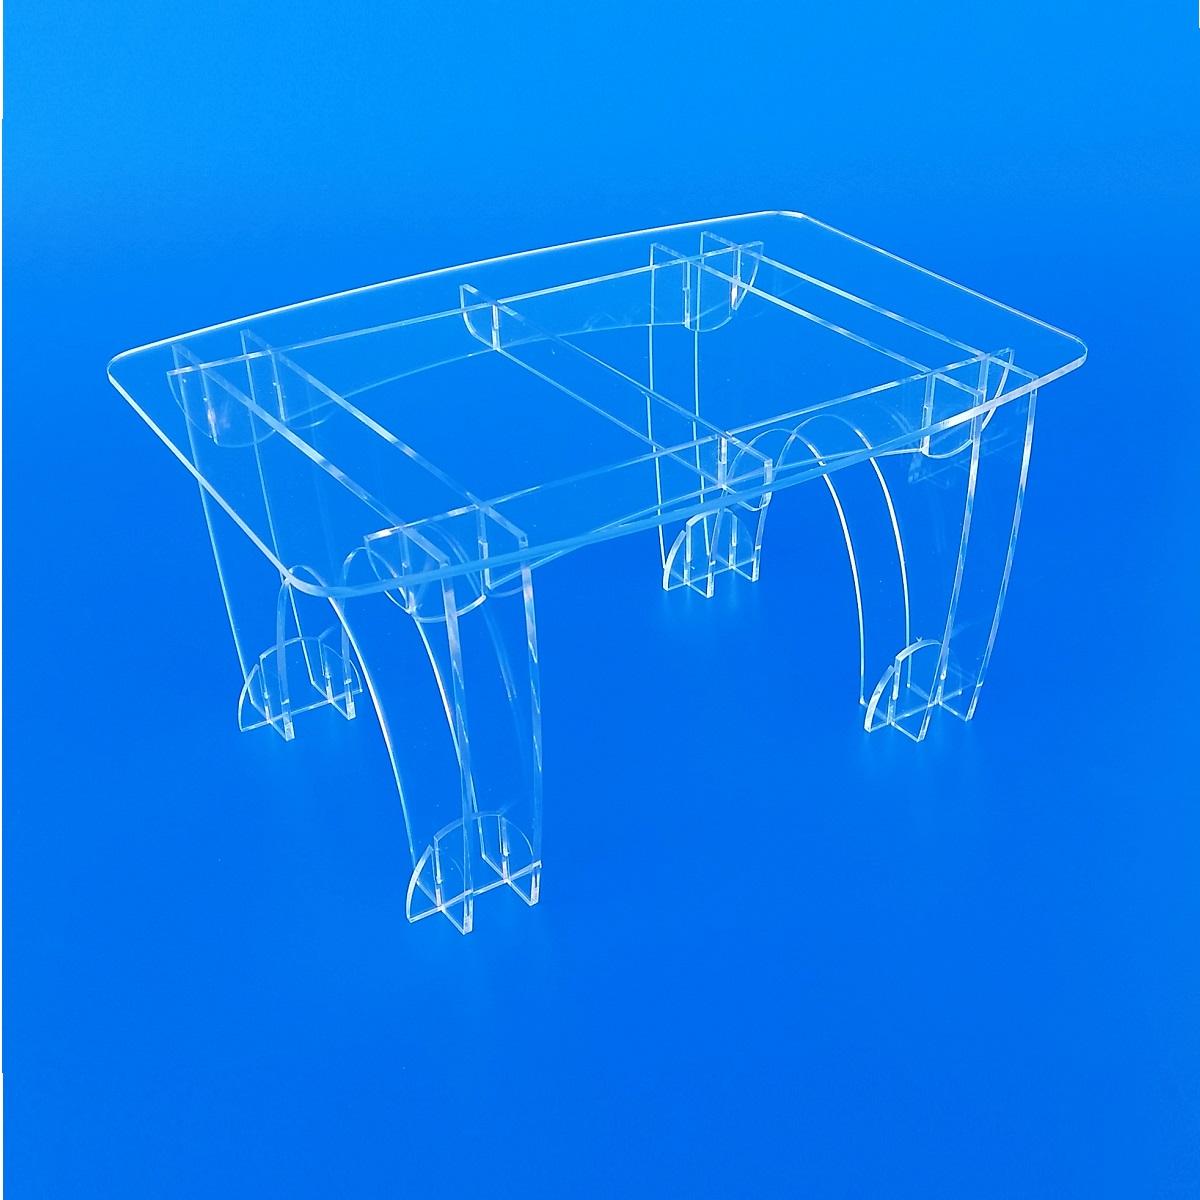 Tavoli in plexiglass su misura prezzi online taglio laser - Tavoli su misura on line ...